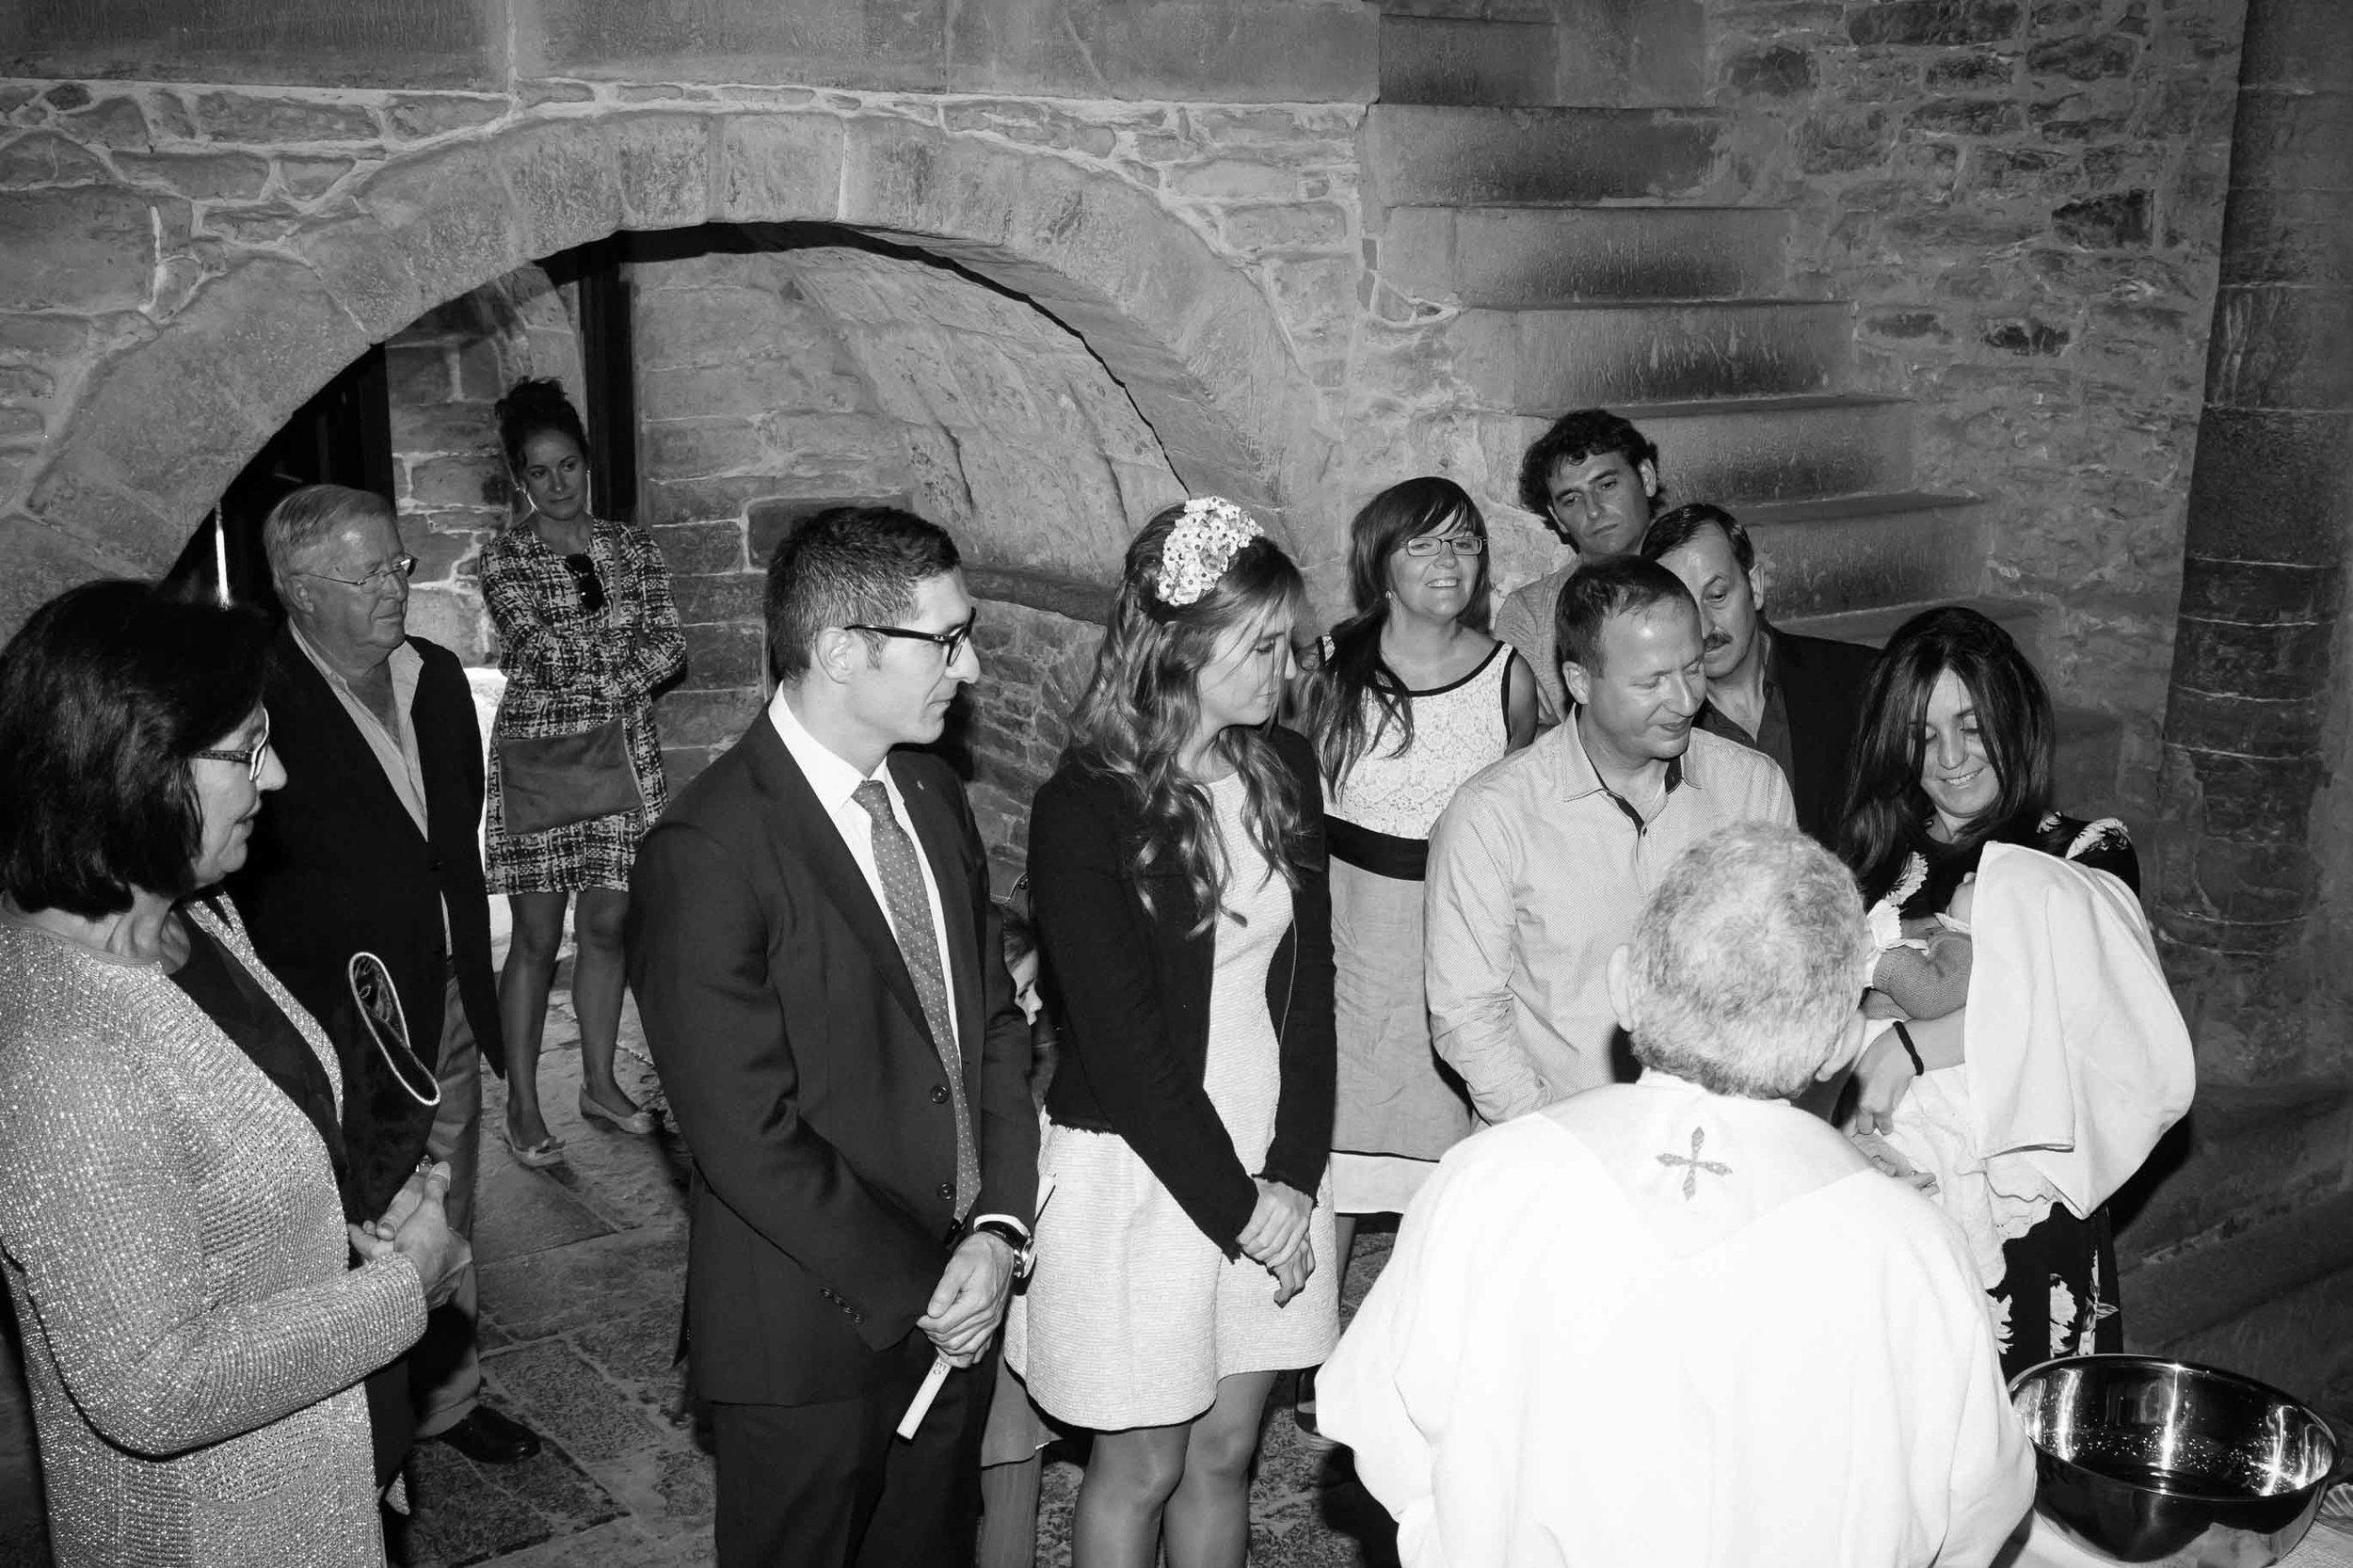 bautizo en pola de lena asturias fotografo bebes-13.JPG